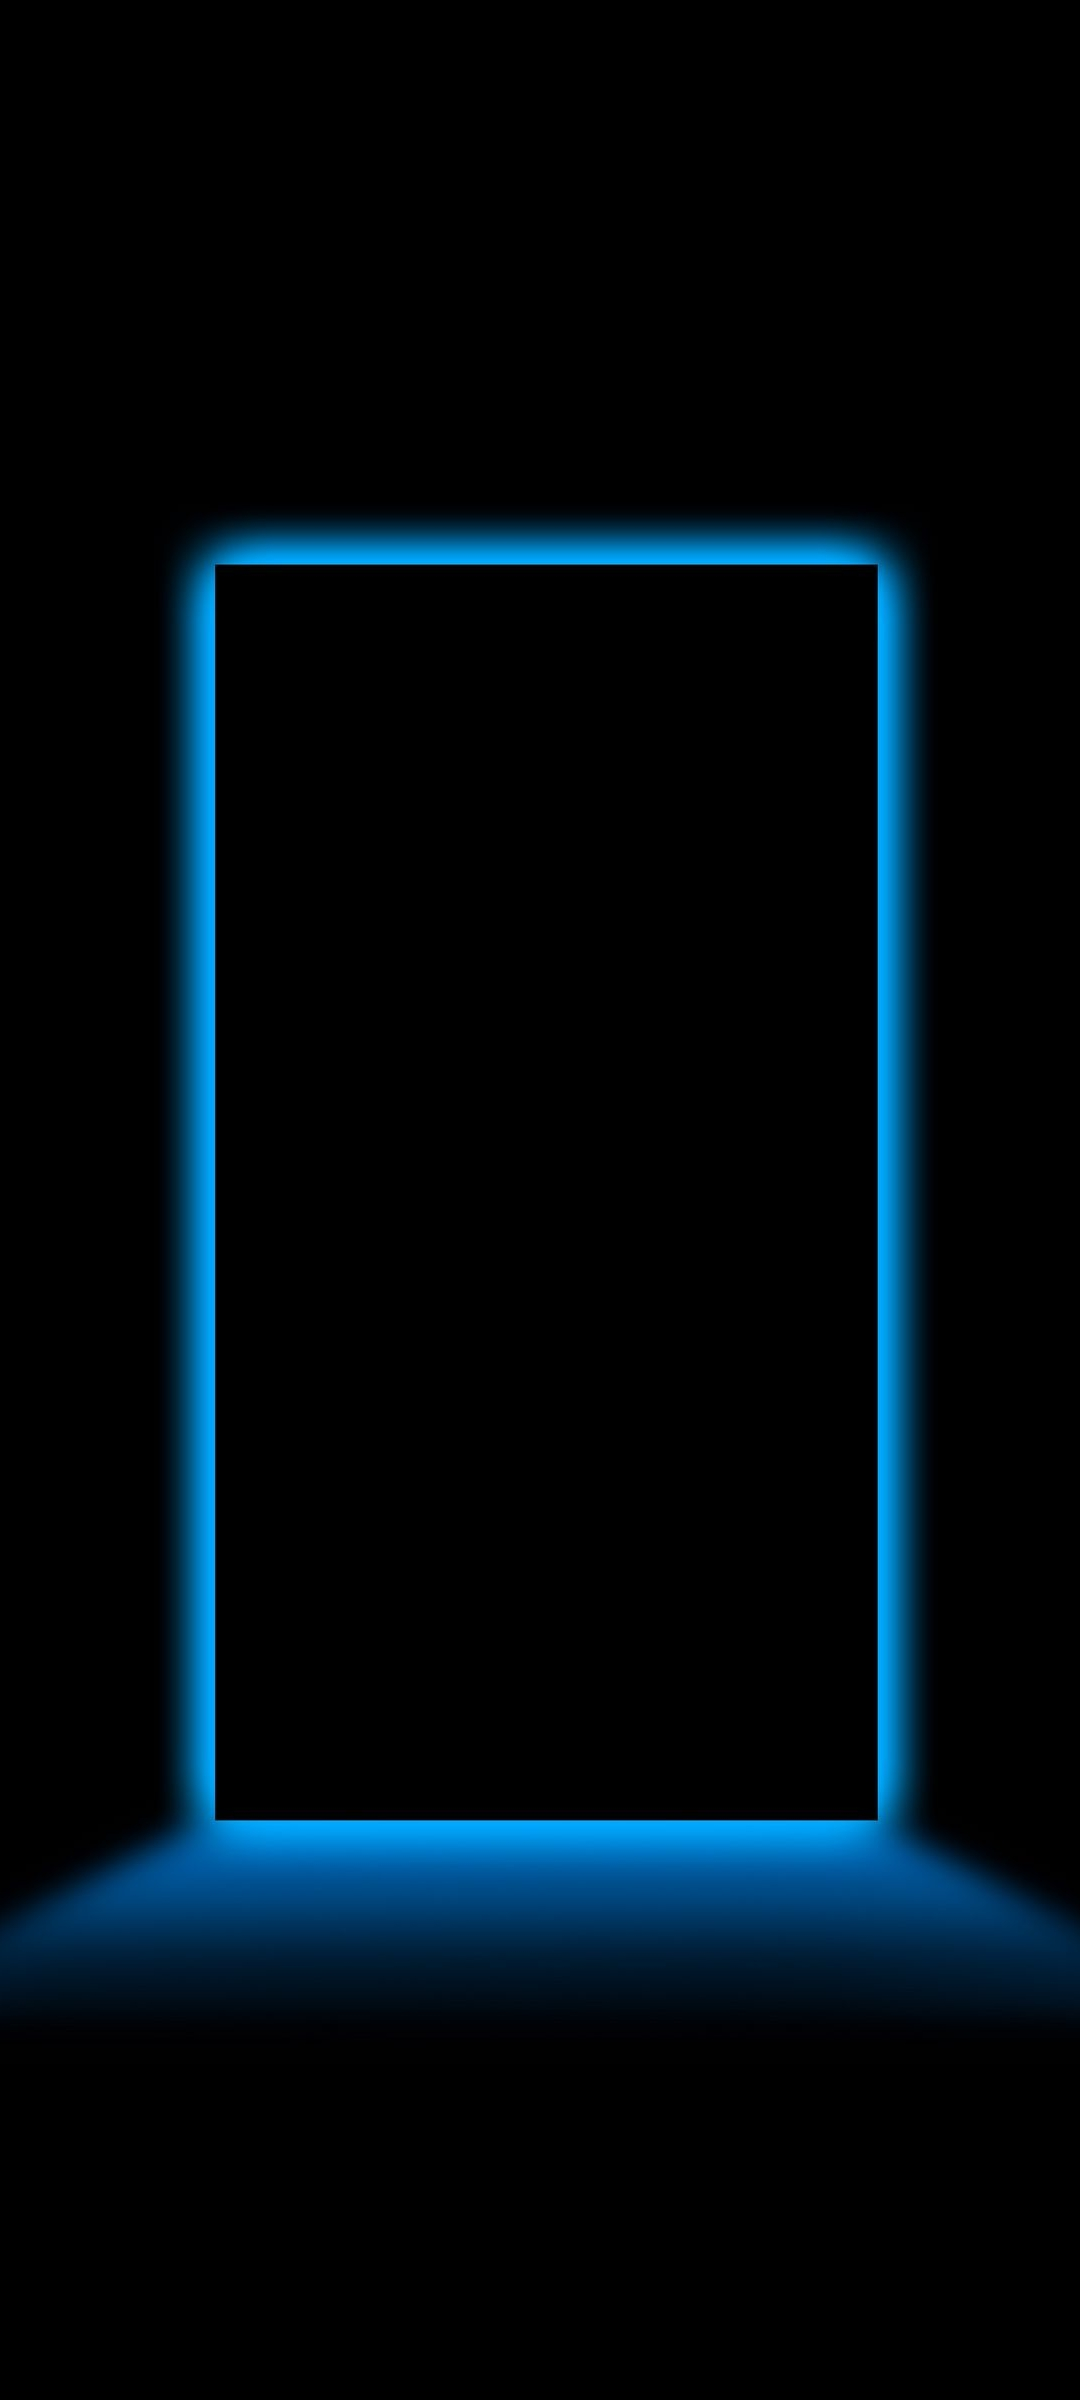 Border Amoled Black Neon Wallpaper 81